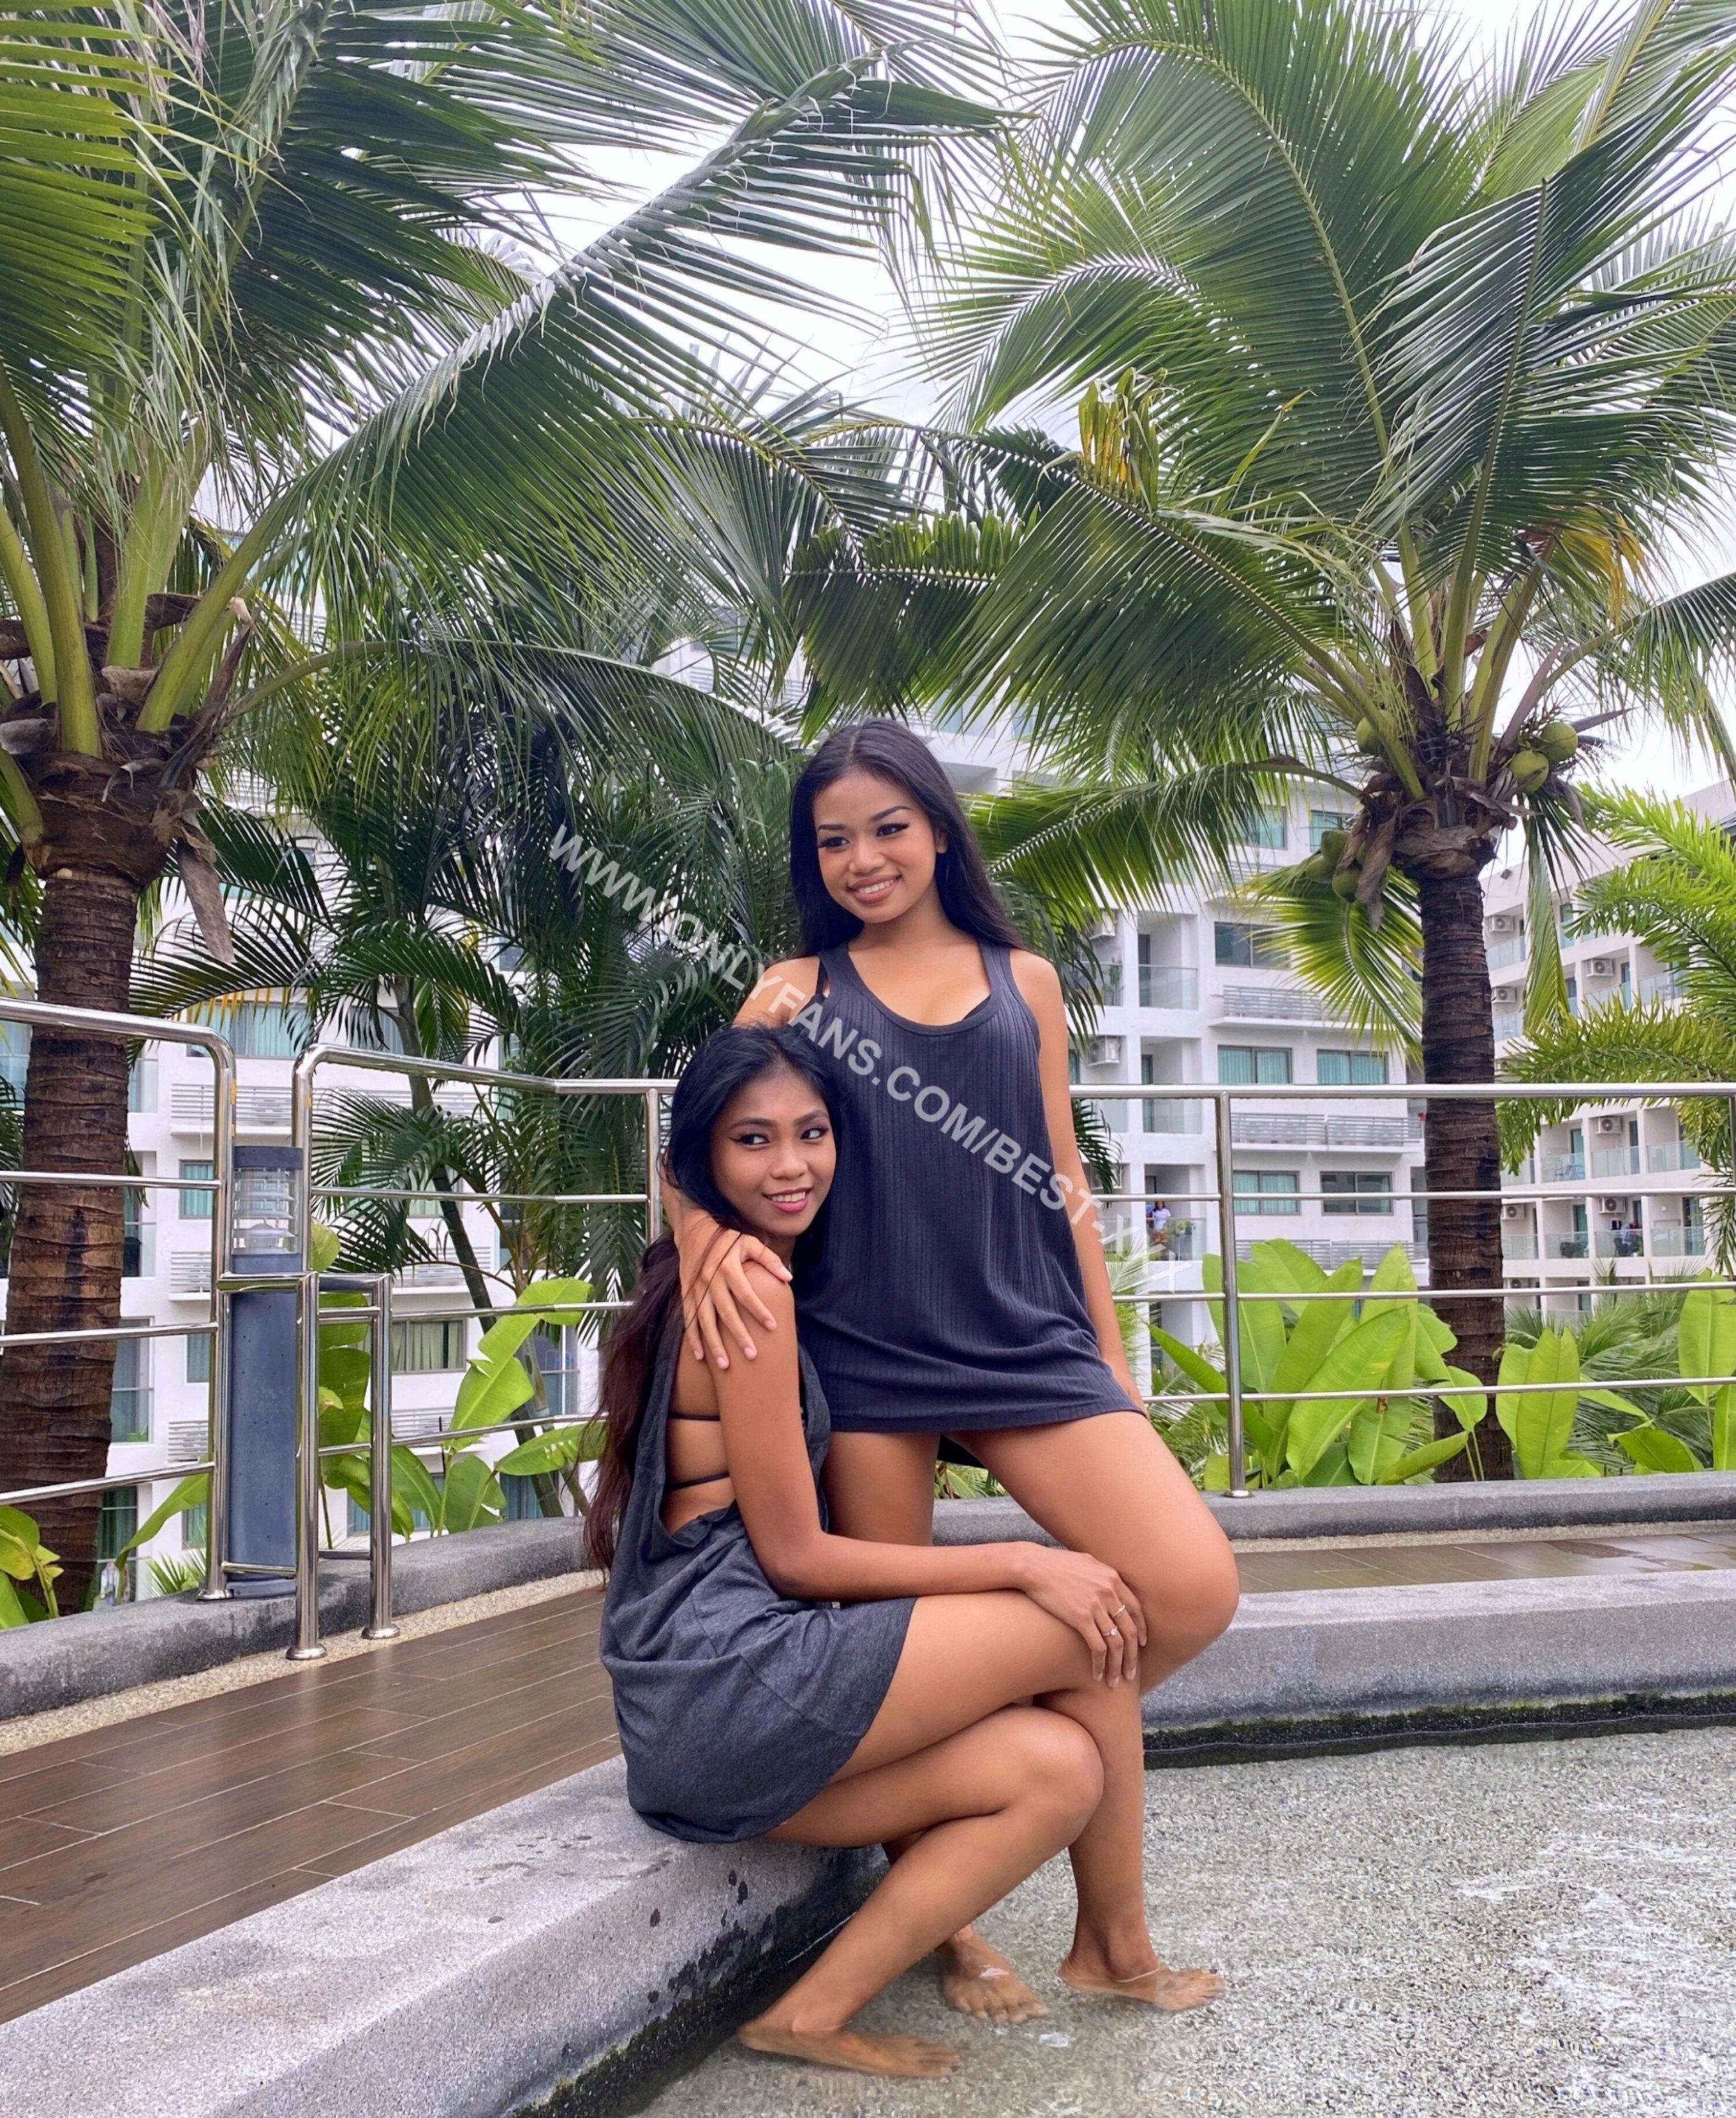 Mo Thai Pattaya Girl Leaked Onlyfans Best Xxx 0015